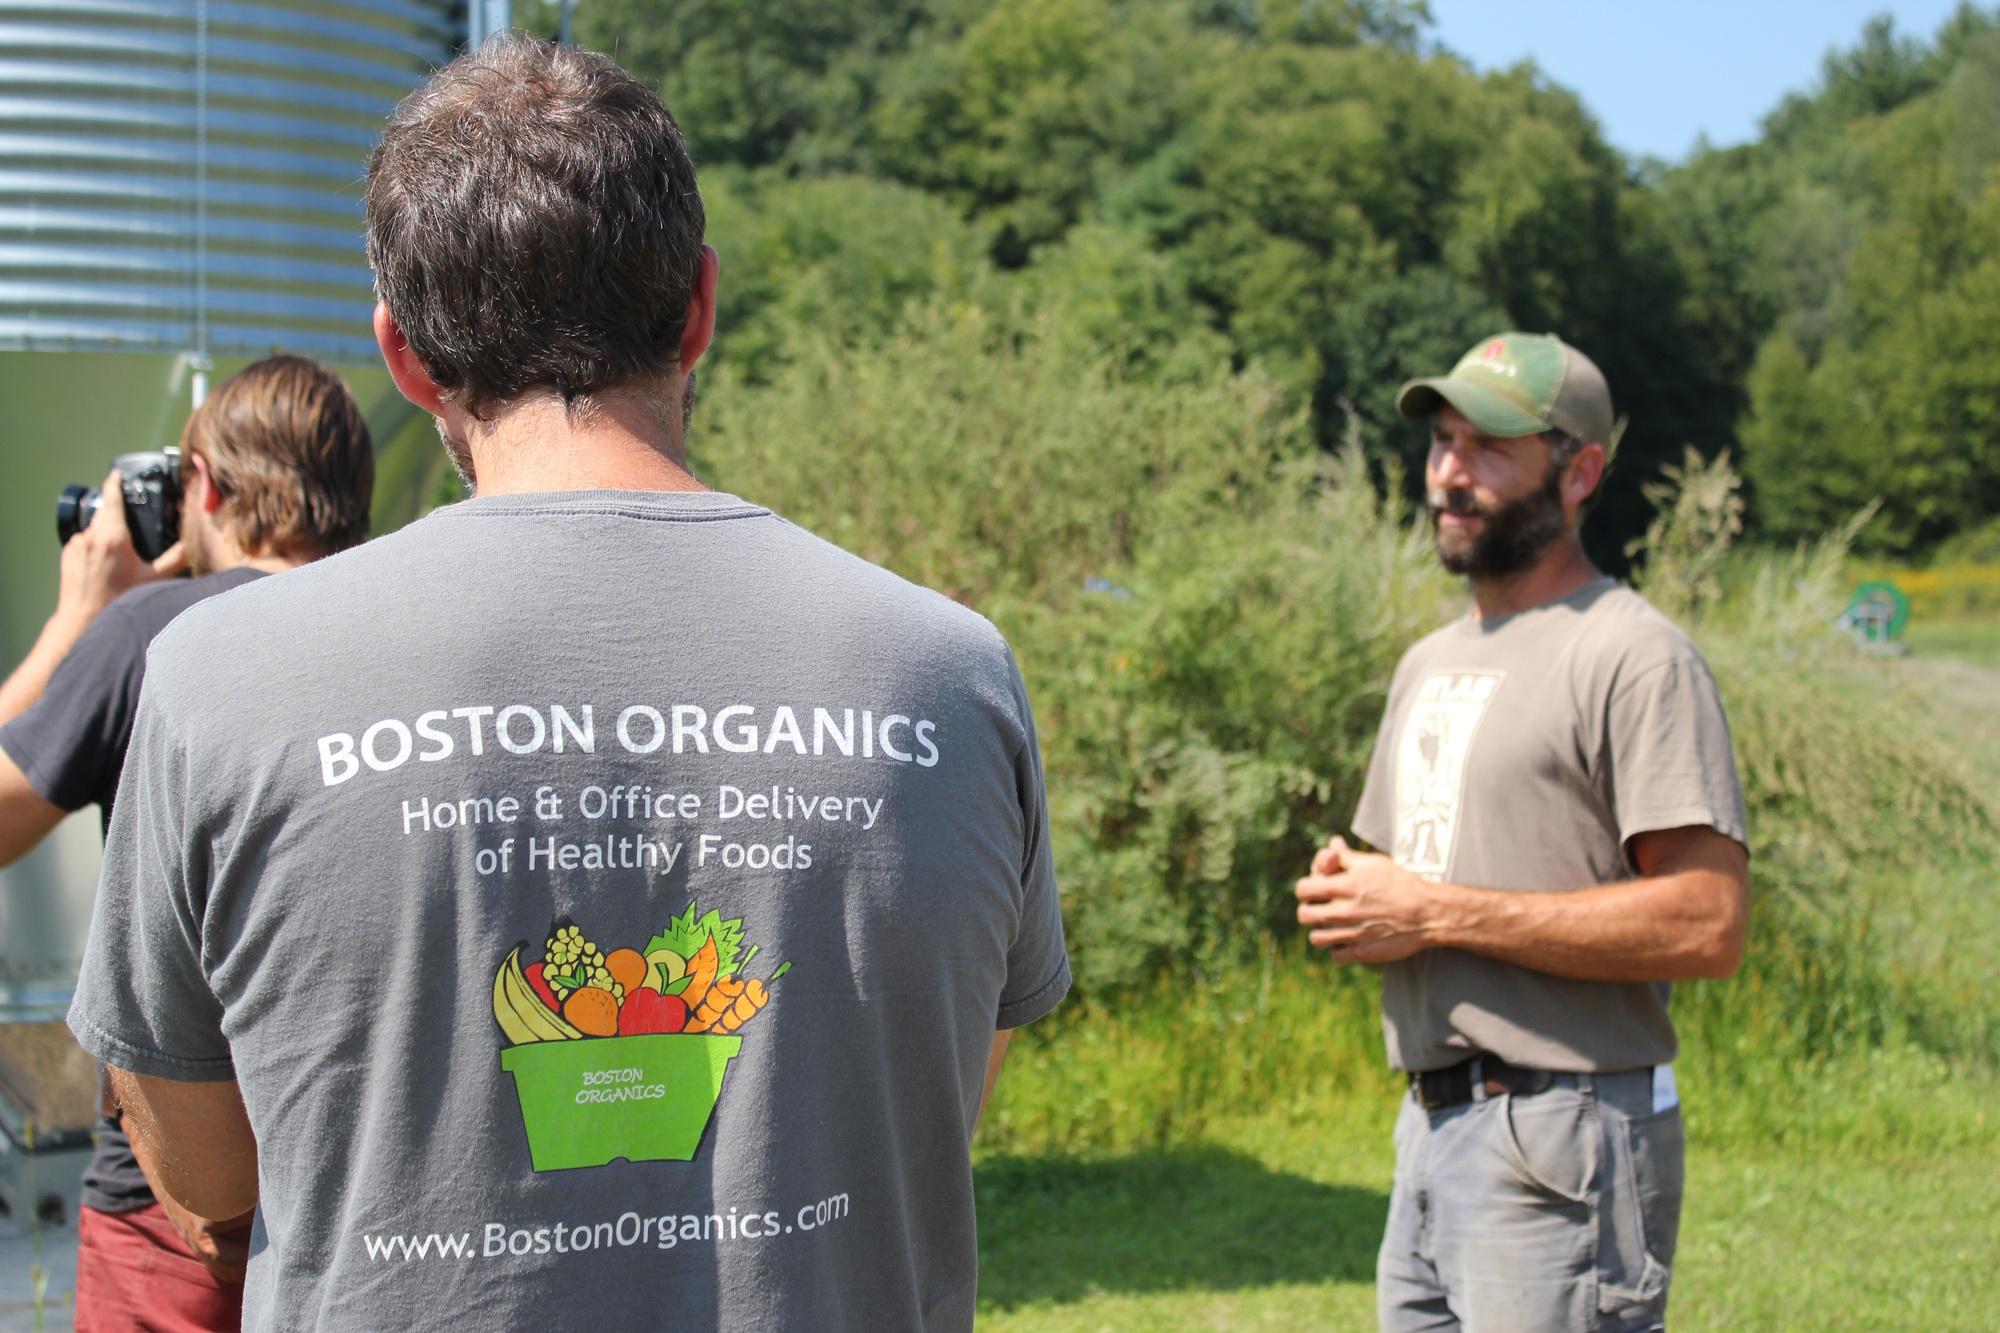 Boston Organics staff pay a visit to Atals Farm.